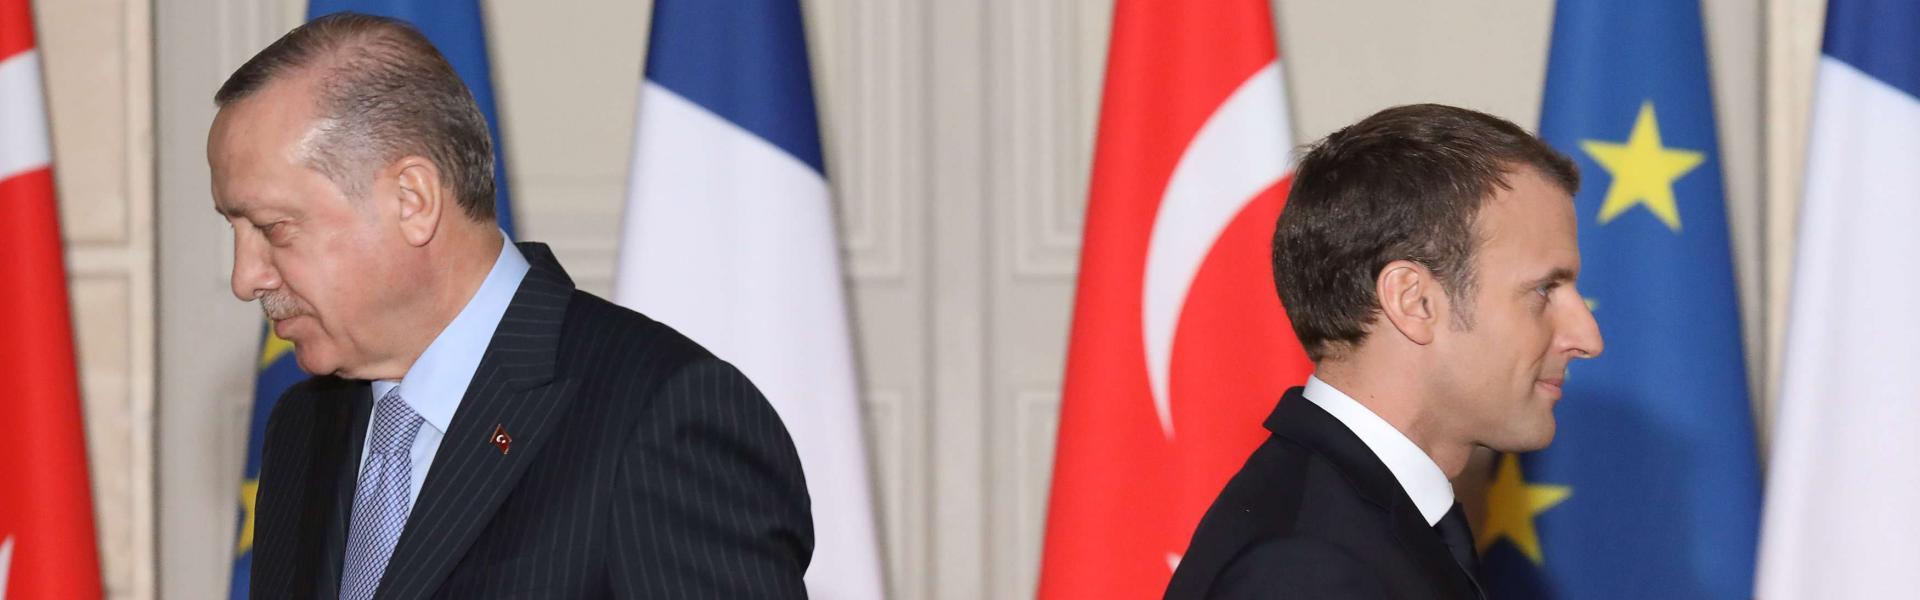 Erdoğan says France has no right to speak about East Mediterranean 2